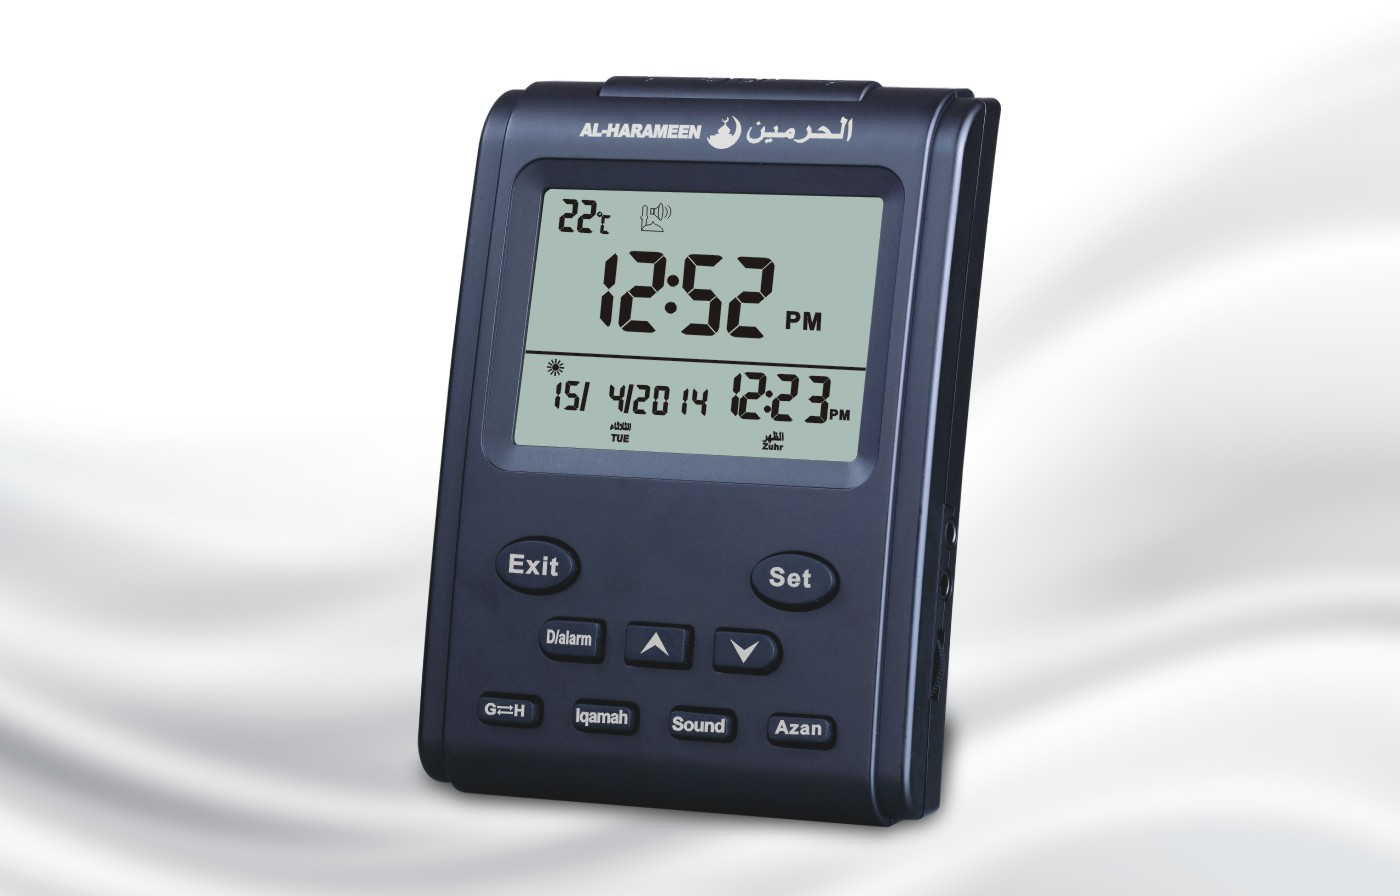 Buy Islamic online in Qatar Shop Electronics in Doha Qatar with